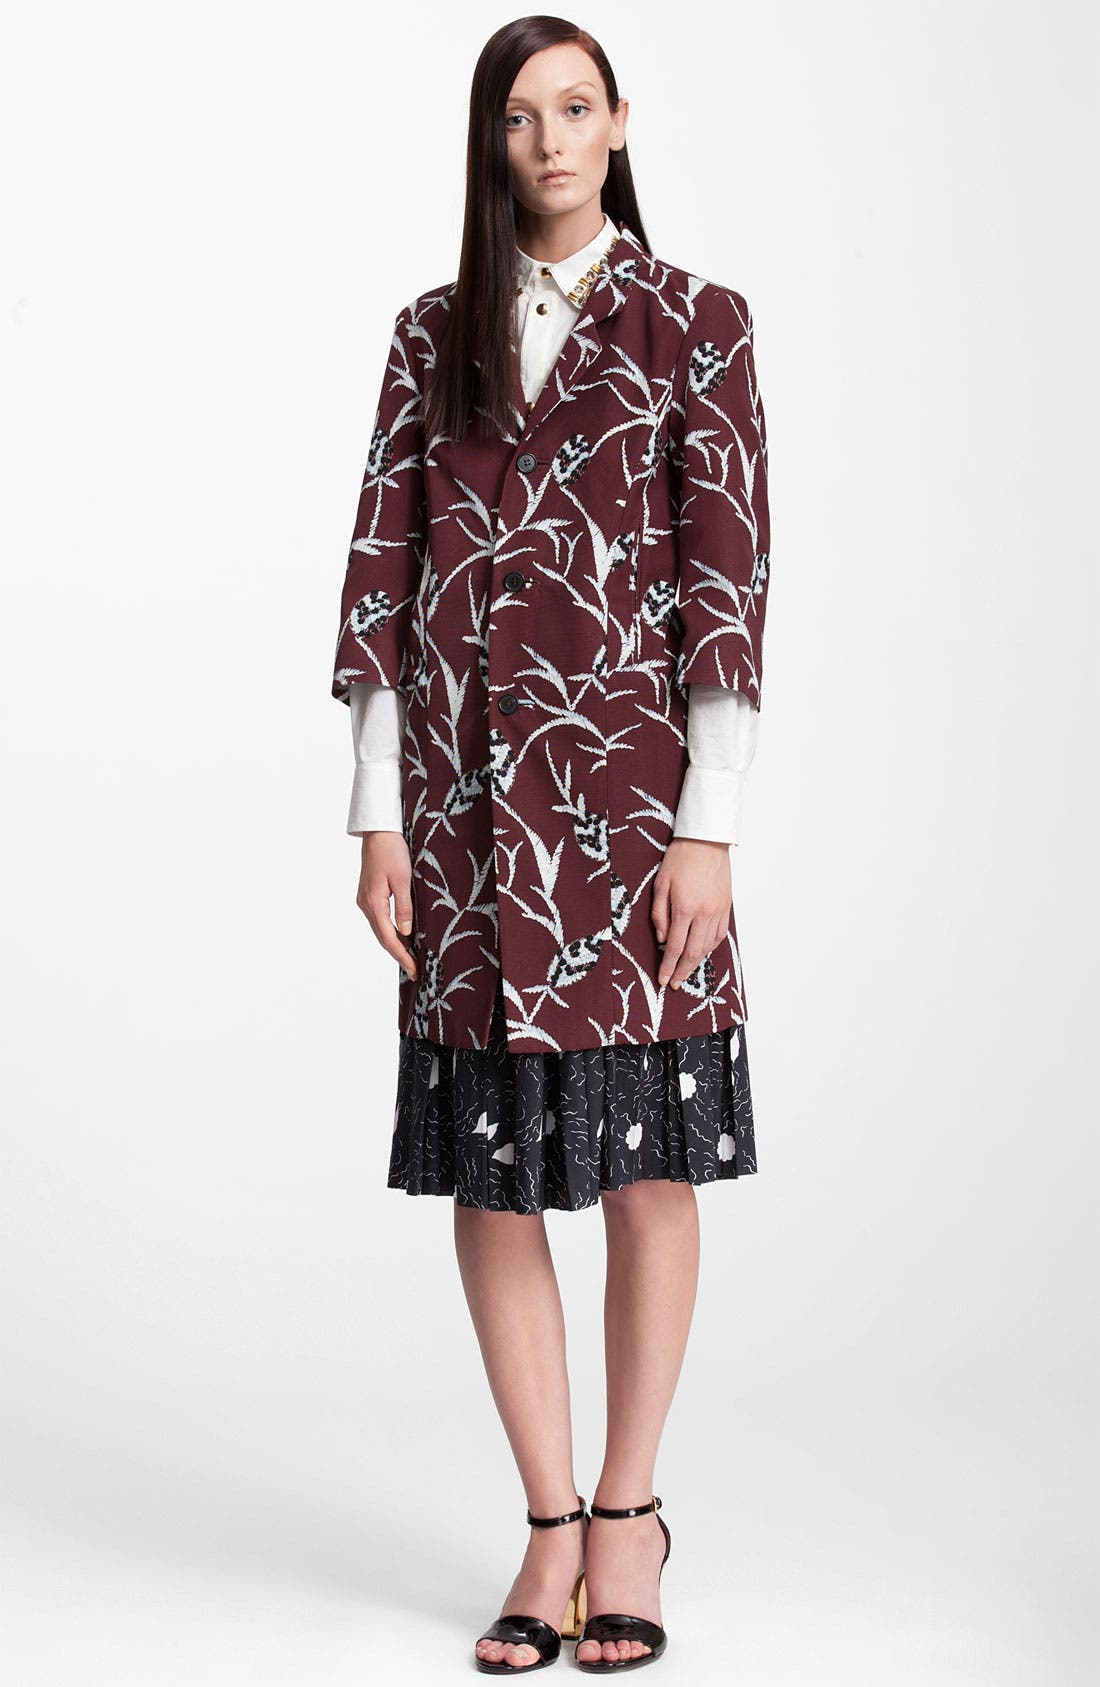 Main Image - Marni Floral Structure Print Cotton Blend Coat